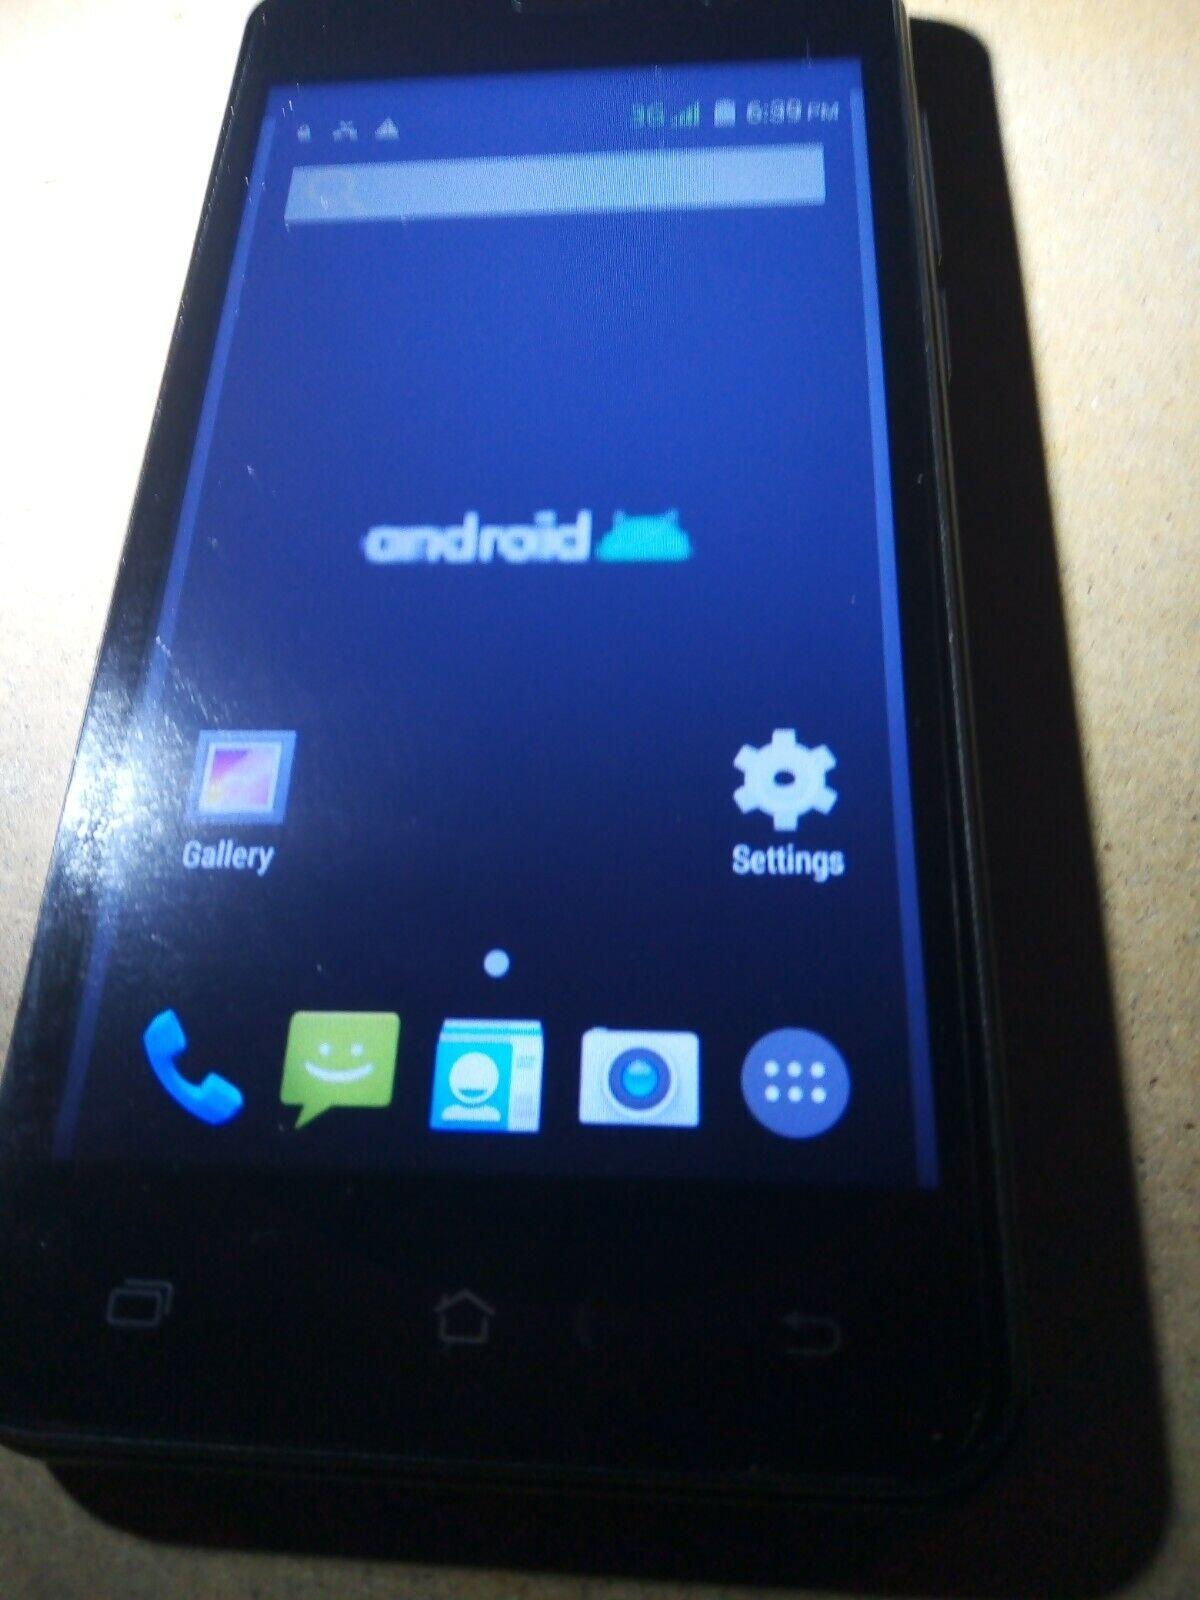 Android Phone - Mobile Phone 32gb storage 3g 4g quad core black p20 unlocked dual sim